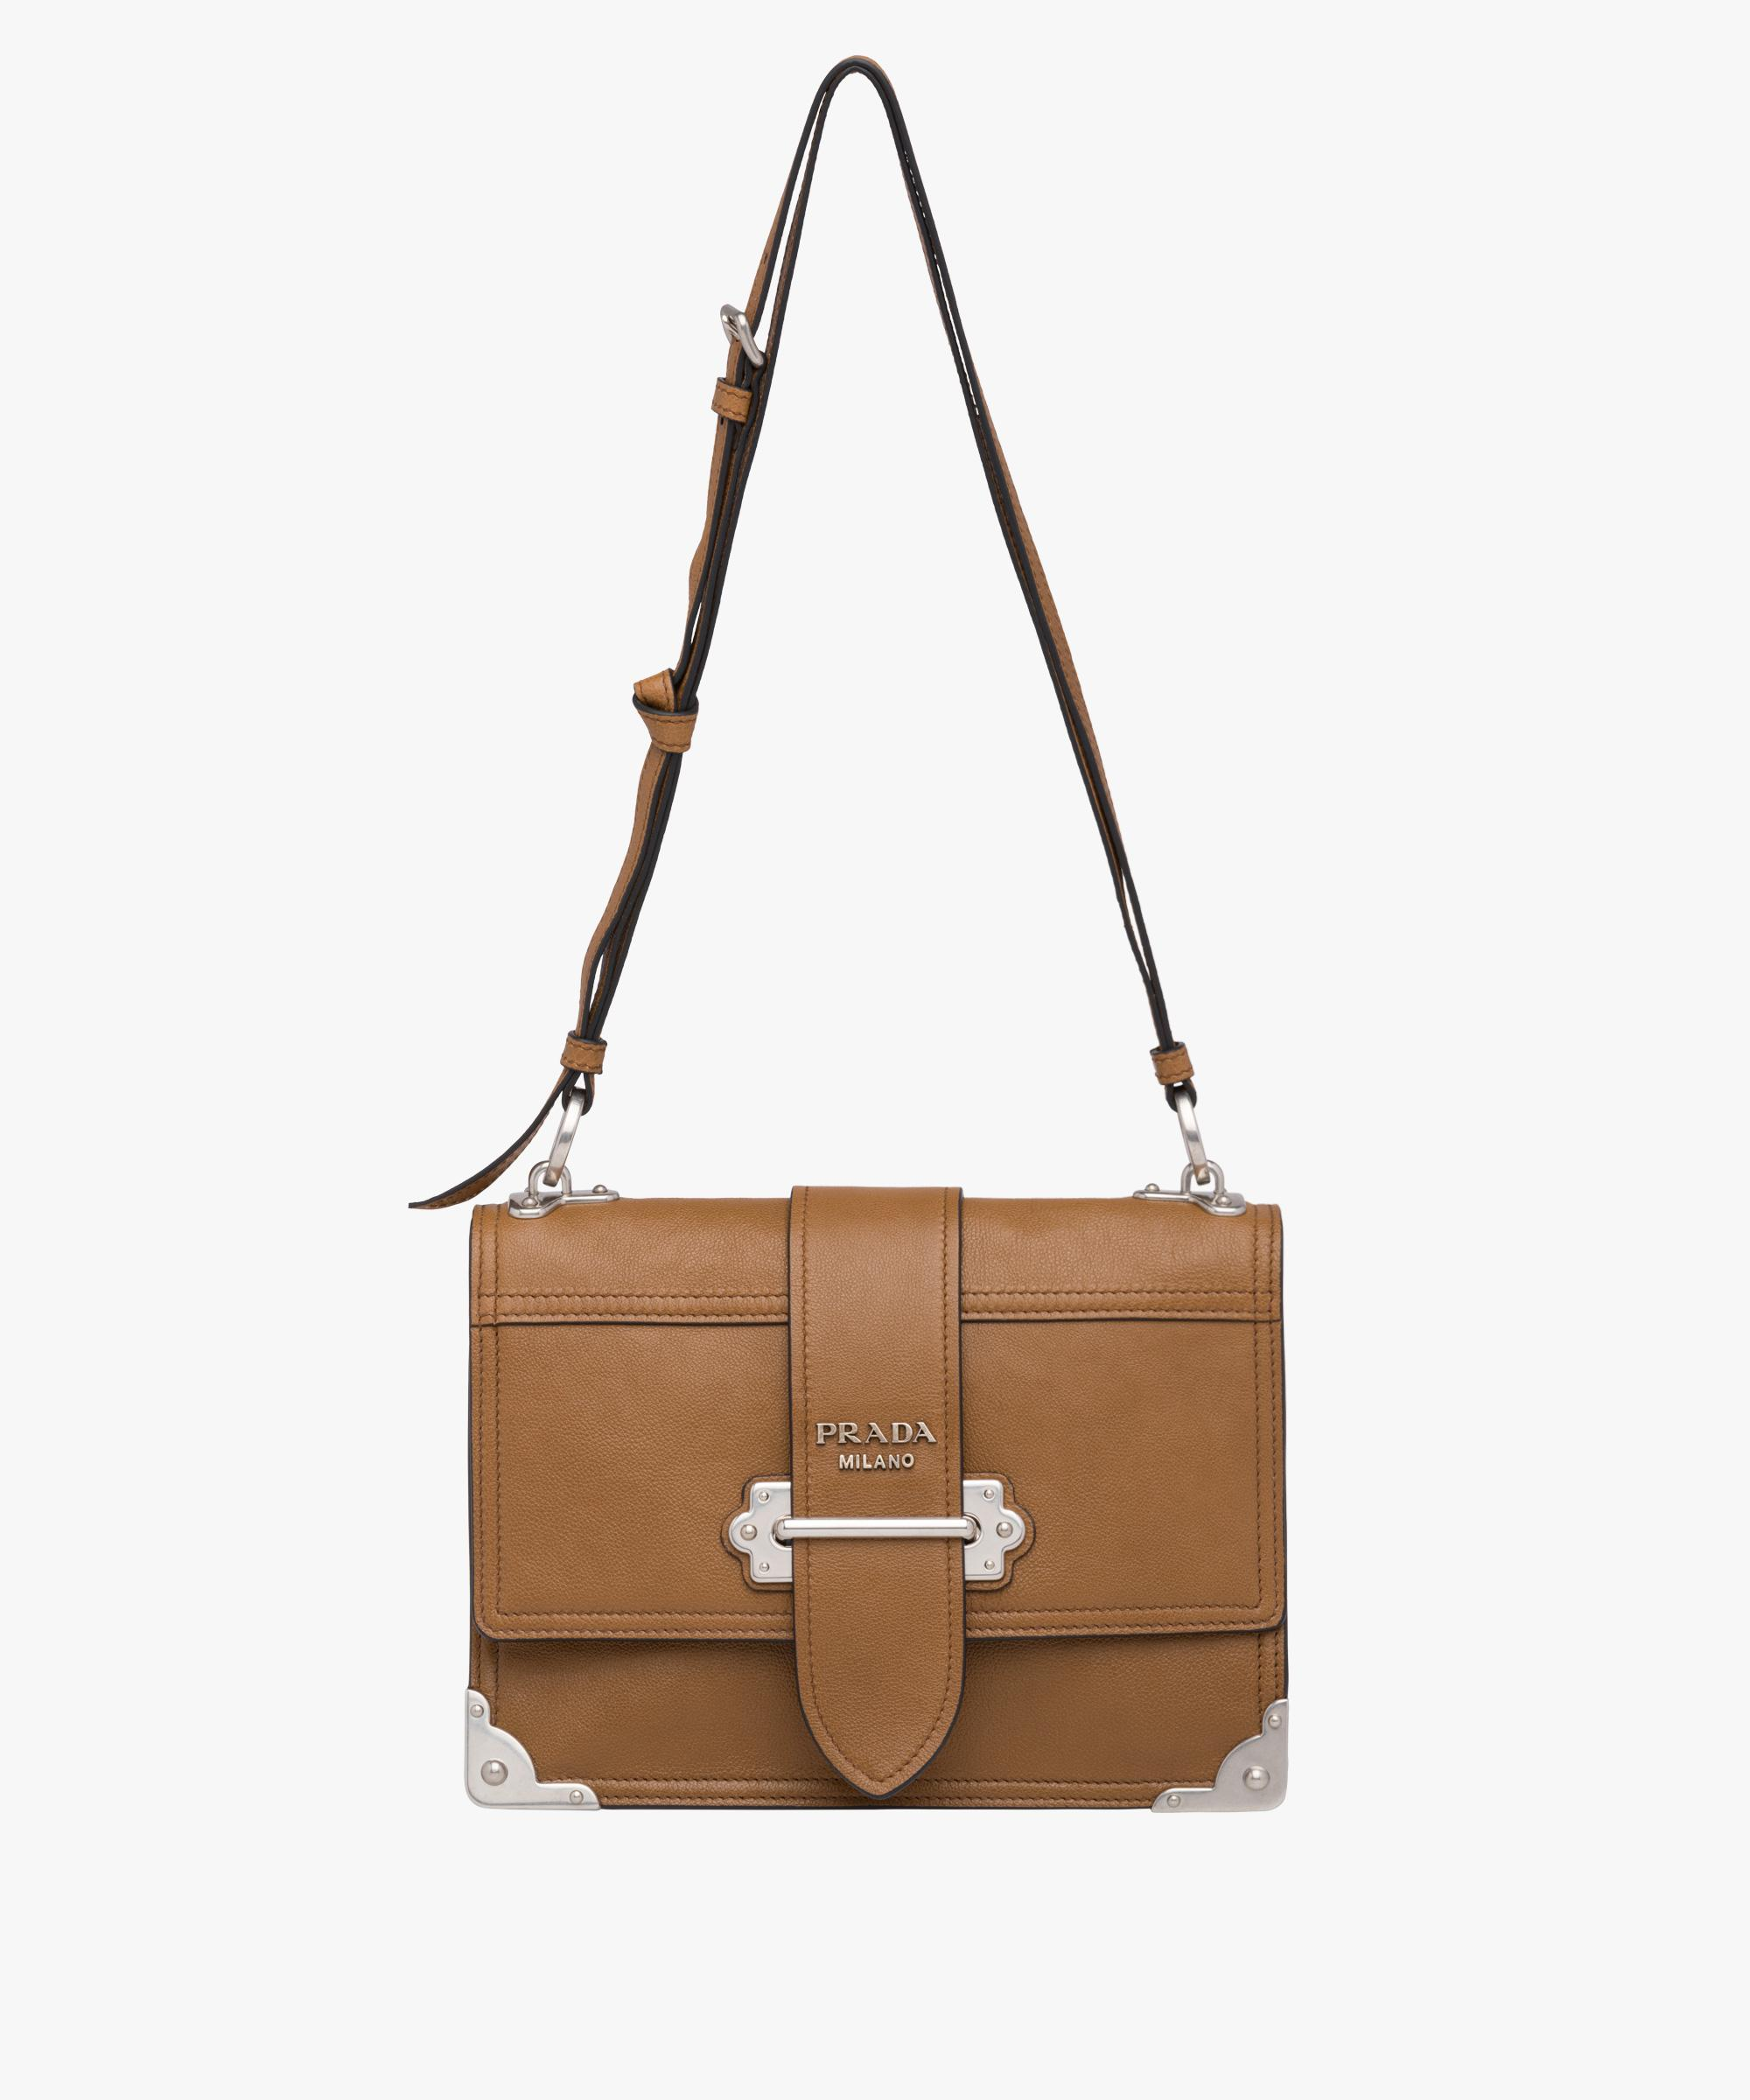 ... uk lyst prada cahier leather shoulder bag in brown ac777 a82ad ed5b7a08b2868